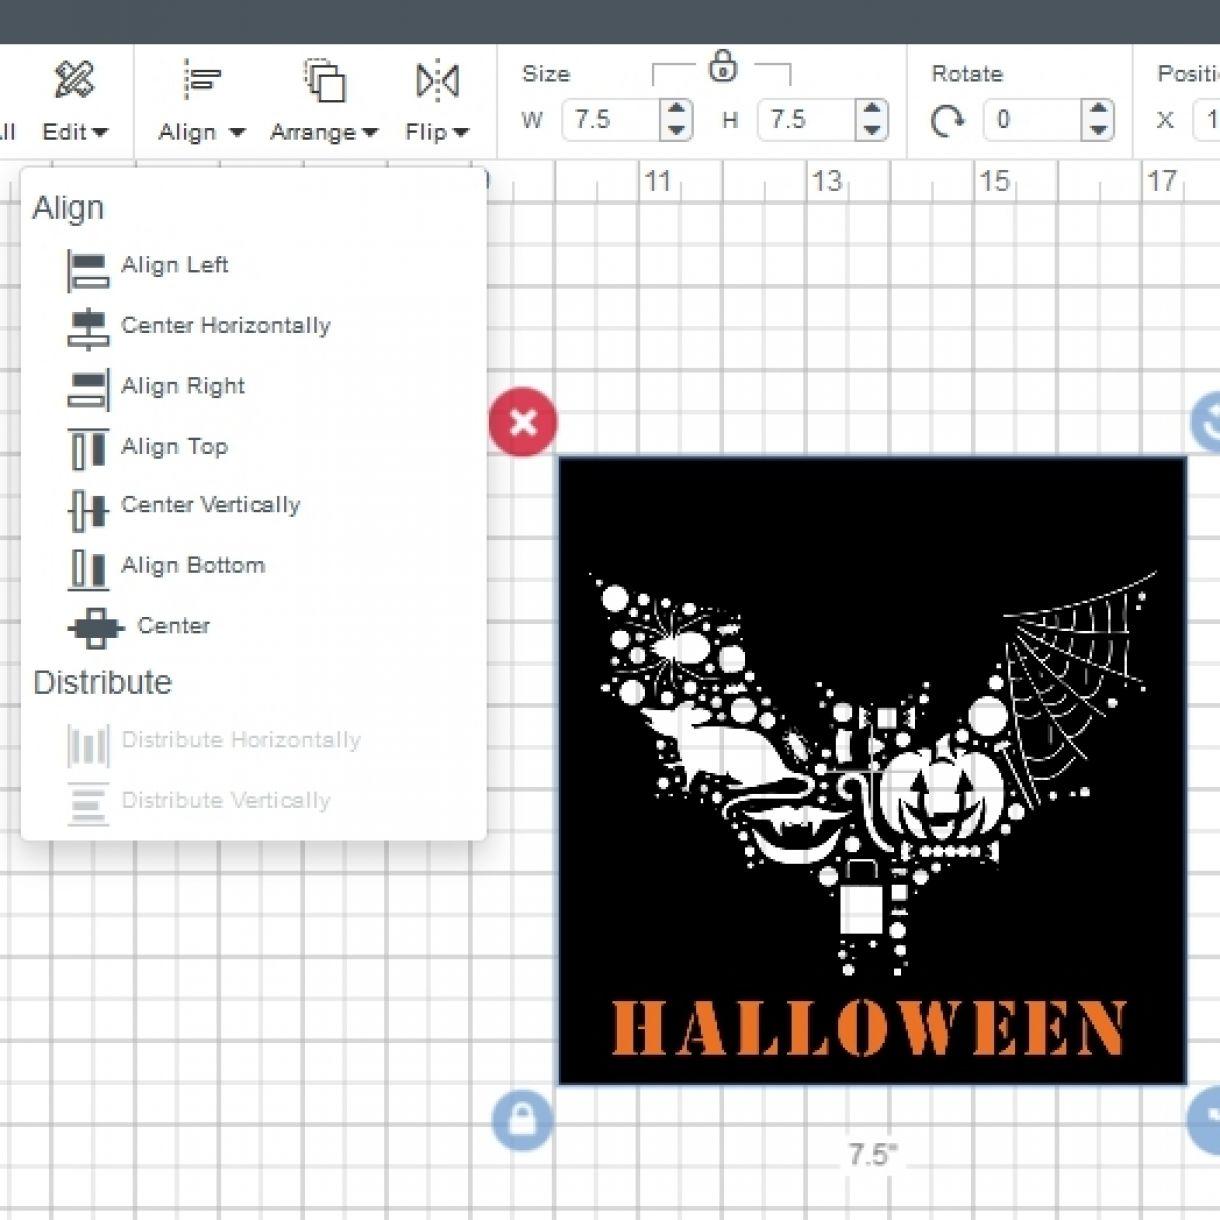 2 Align Screenshot 2017 10 15 Cricut Design Space 1 Align